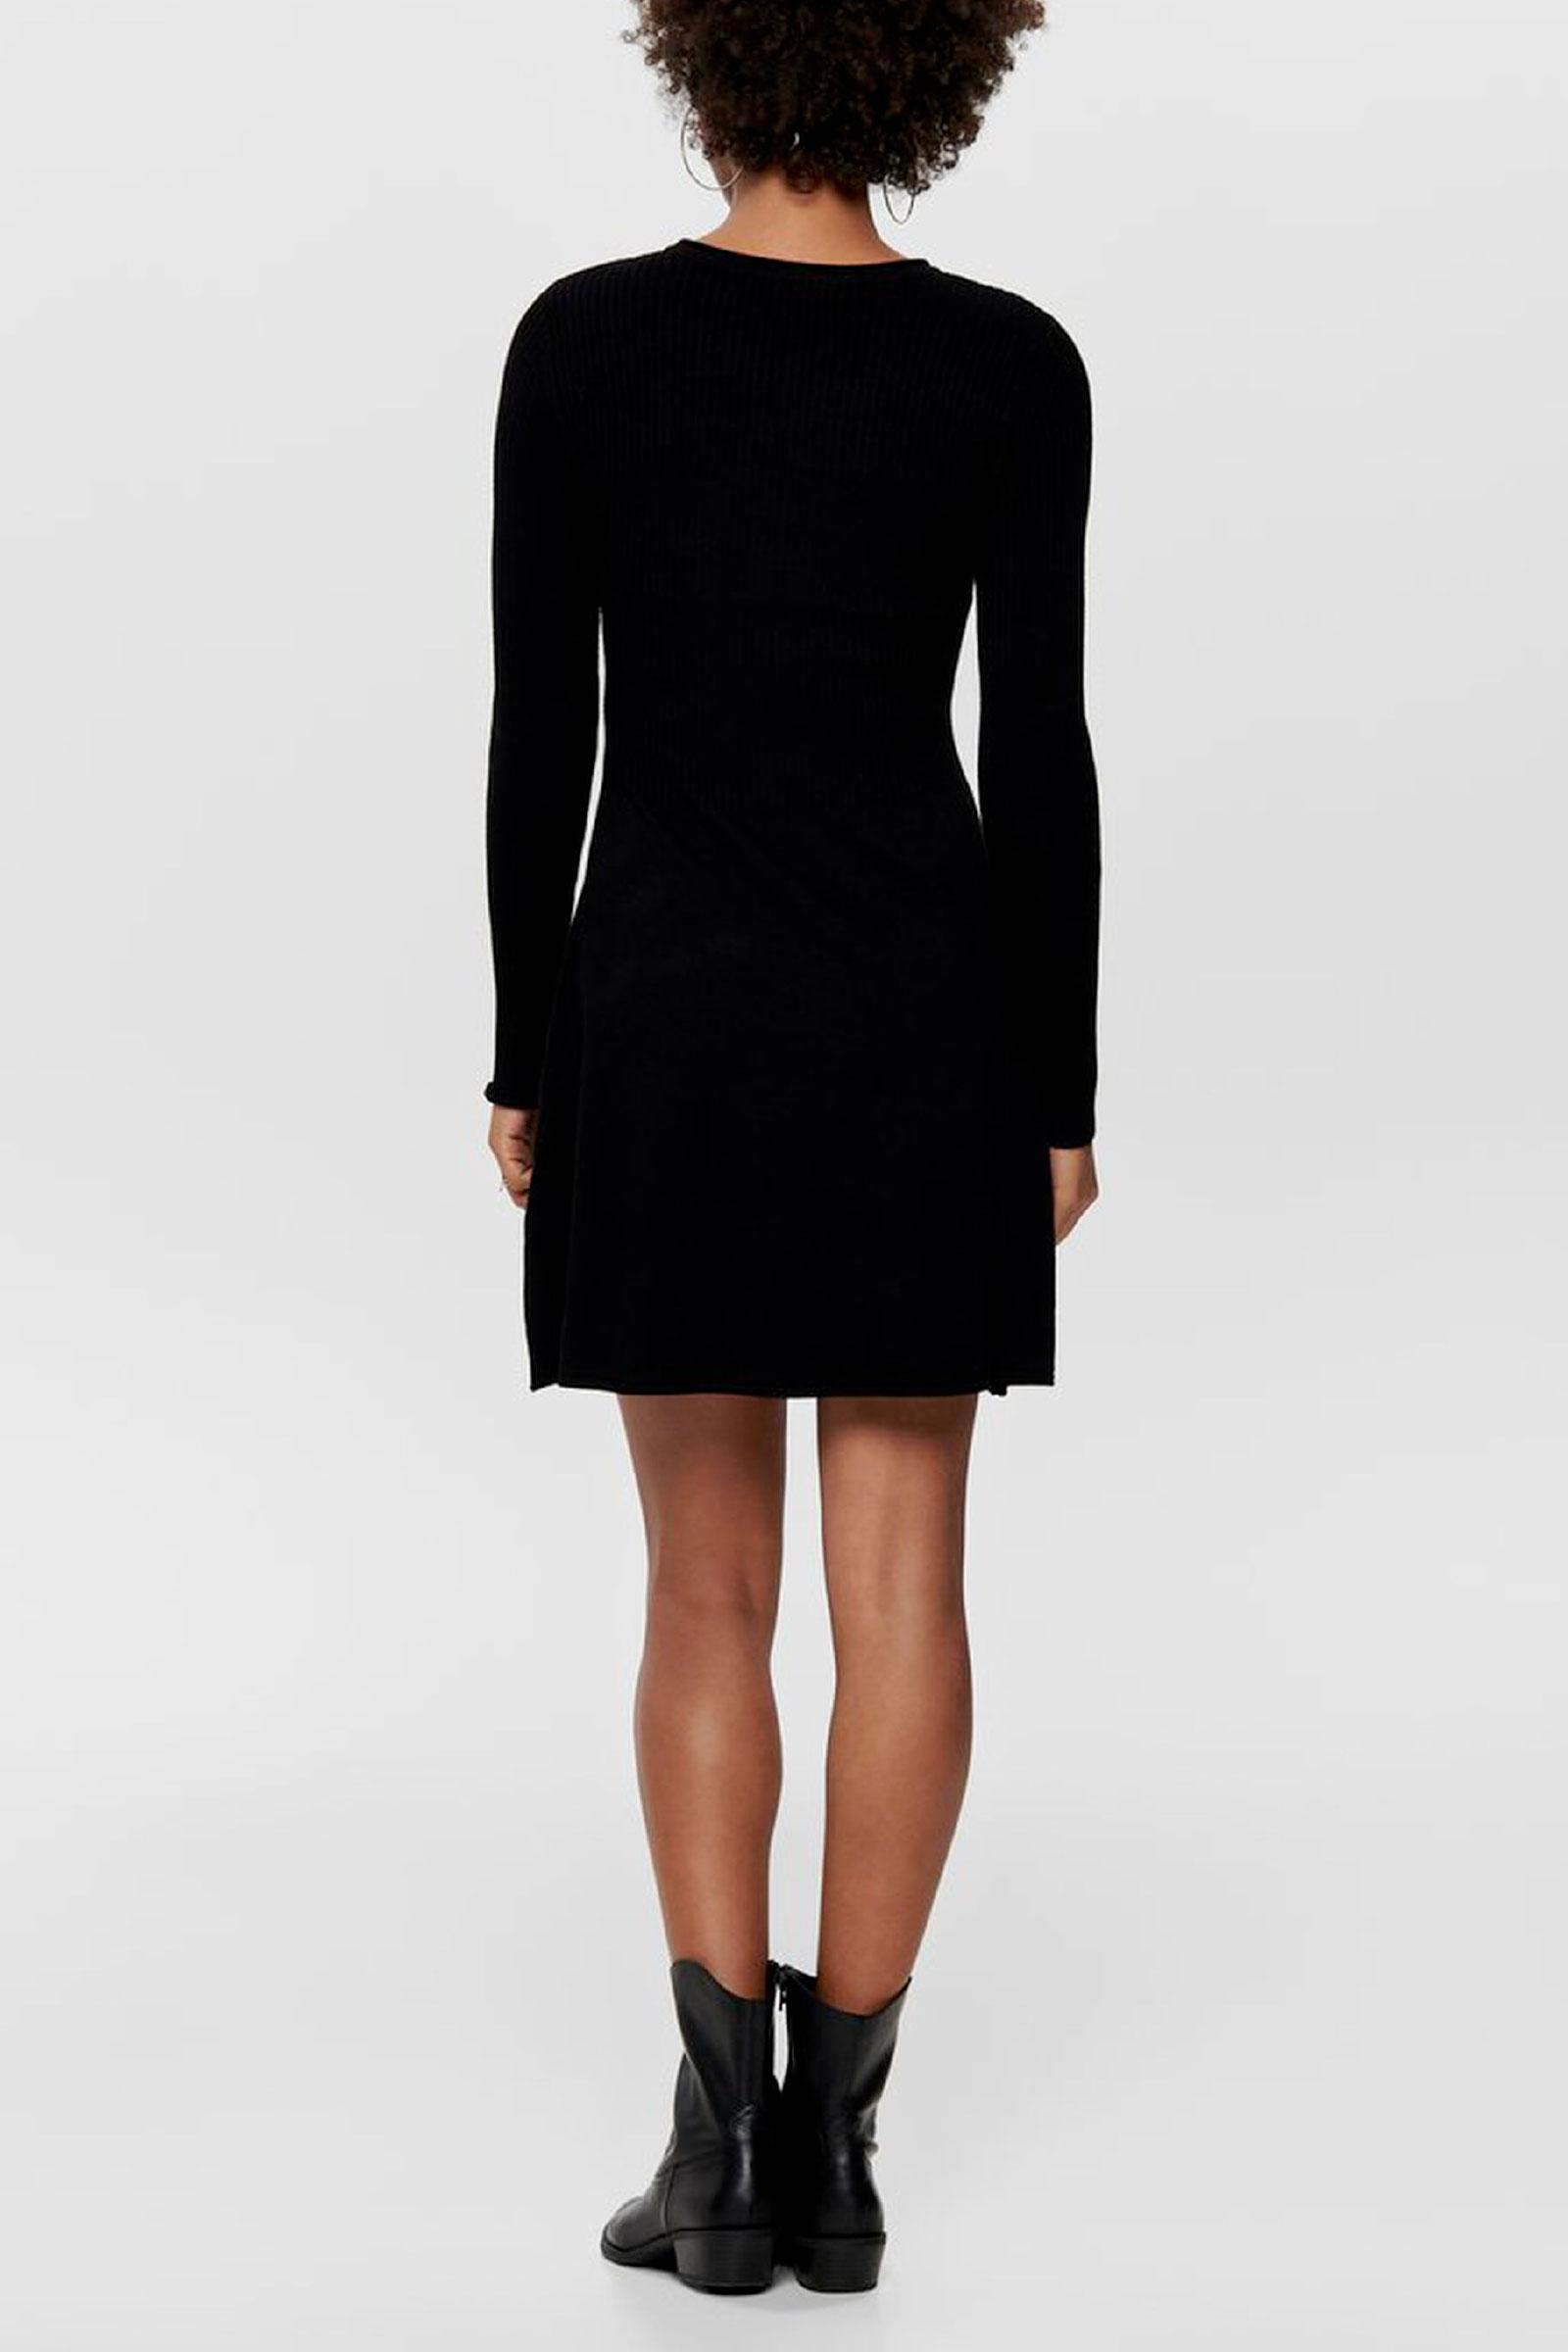 ONLY   Dress   15185761Black